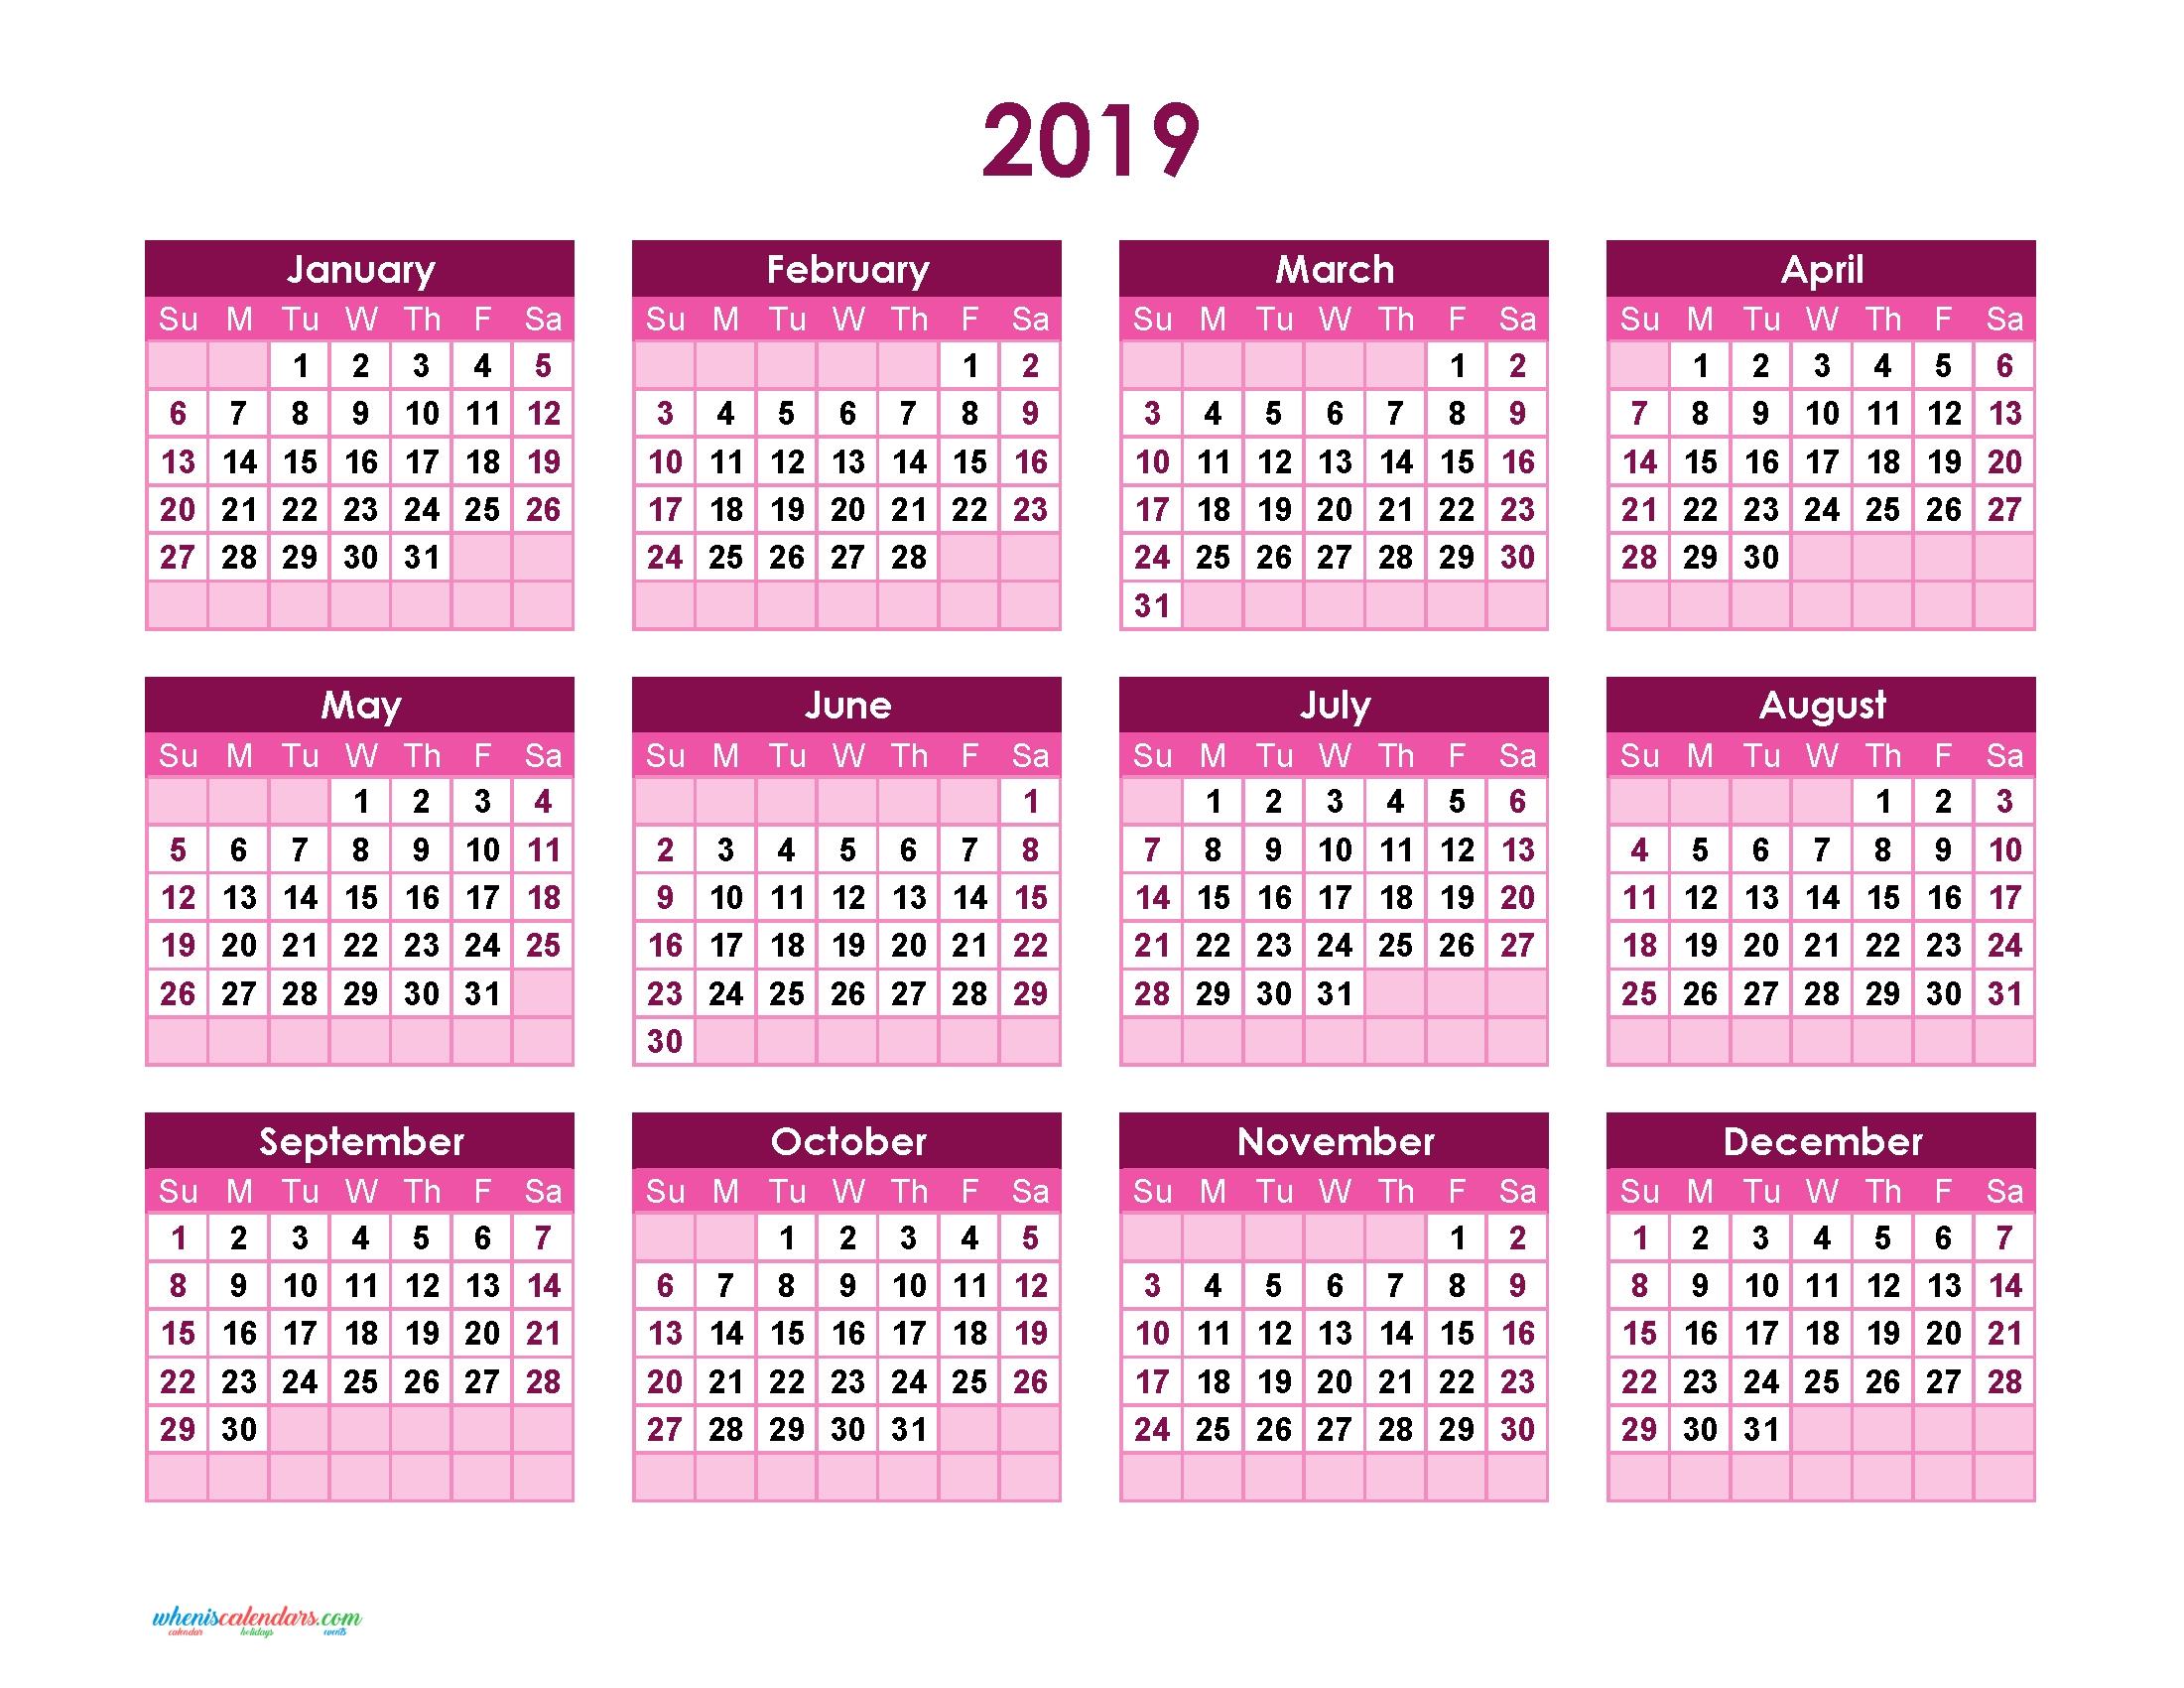 Yearly Calendar 2019 Printable Full Year Calendar 2019 (Theme W 2019 Calendar